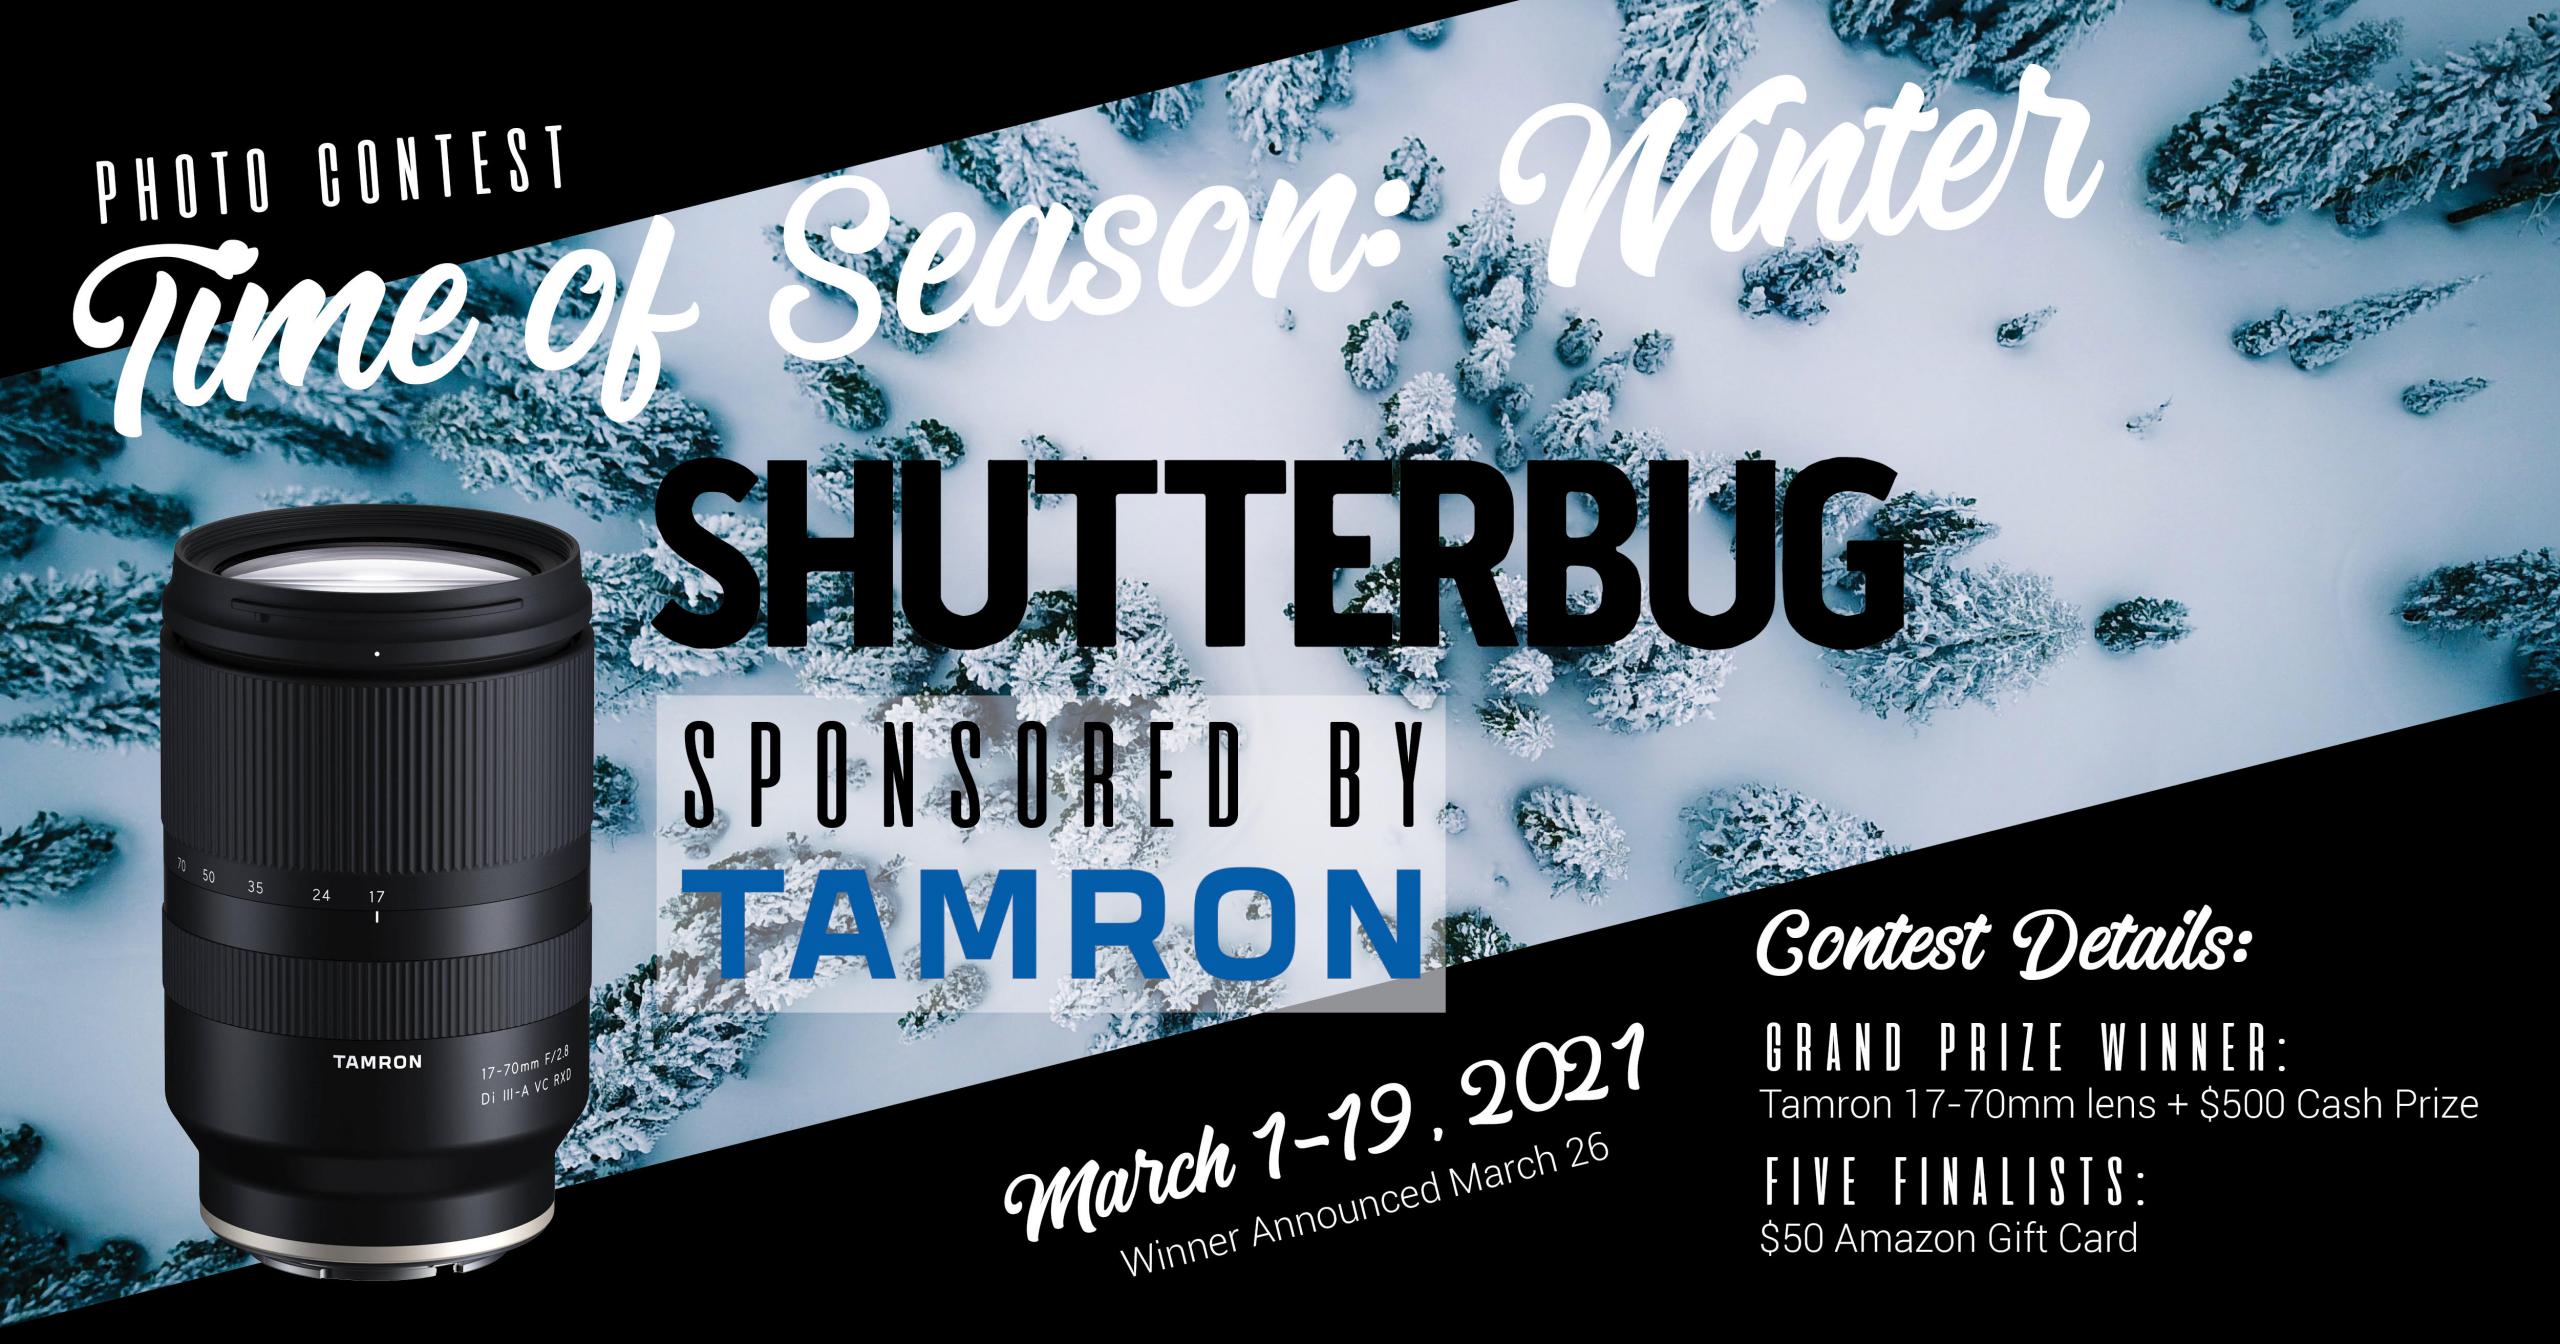 Shutterbug's Time of the Season: Winter